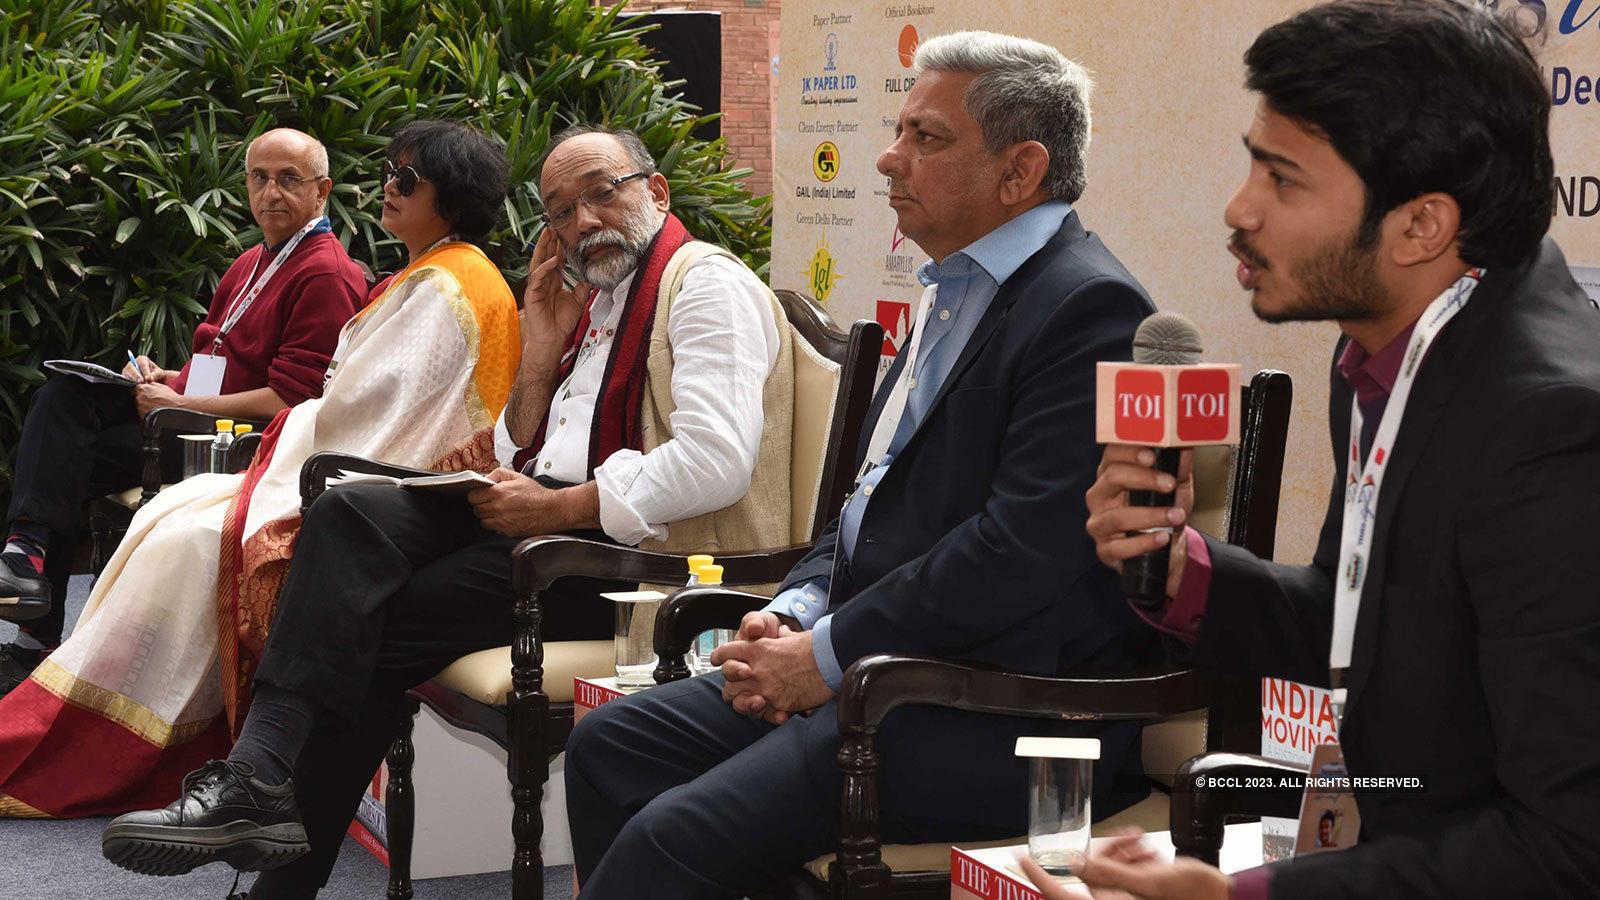 Times LitFest Delhi 2018: Day 1